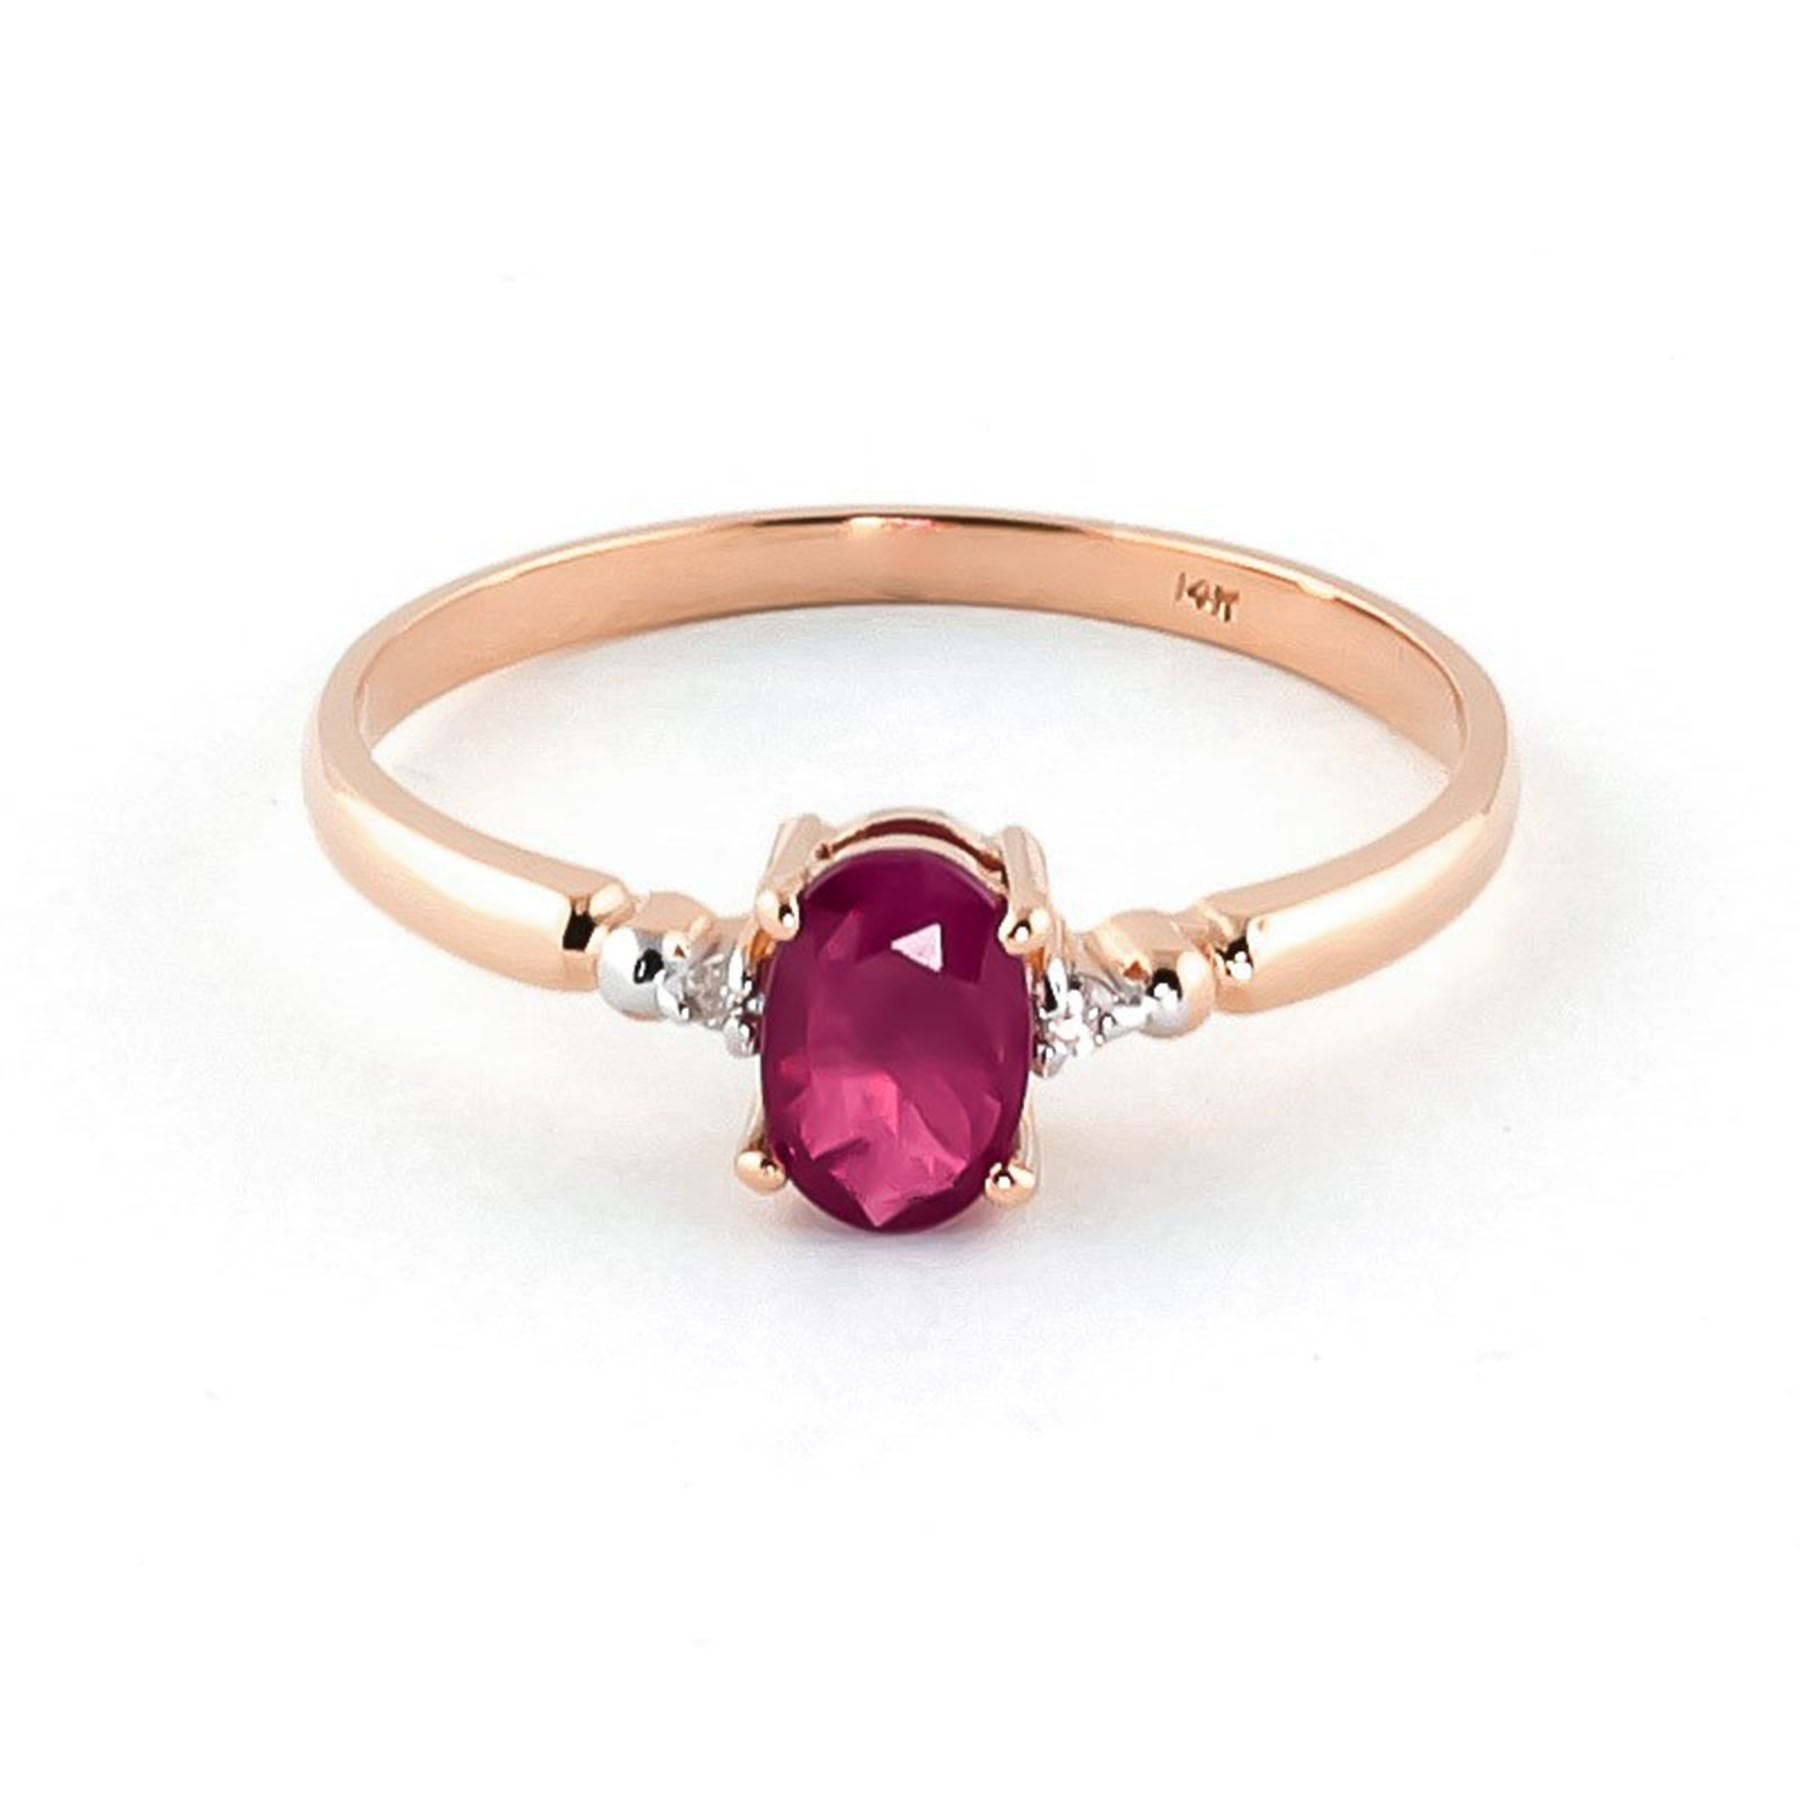 Details about  /Stunning Ruby Gf Gemstone Oval Shape Jewelry 14k Yellow Gold Pendant